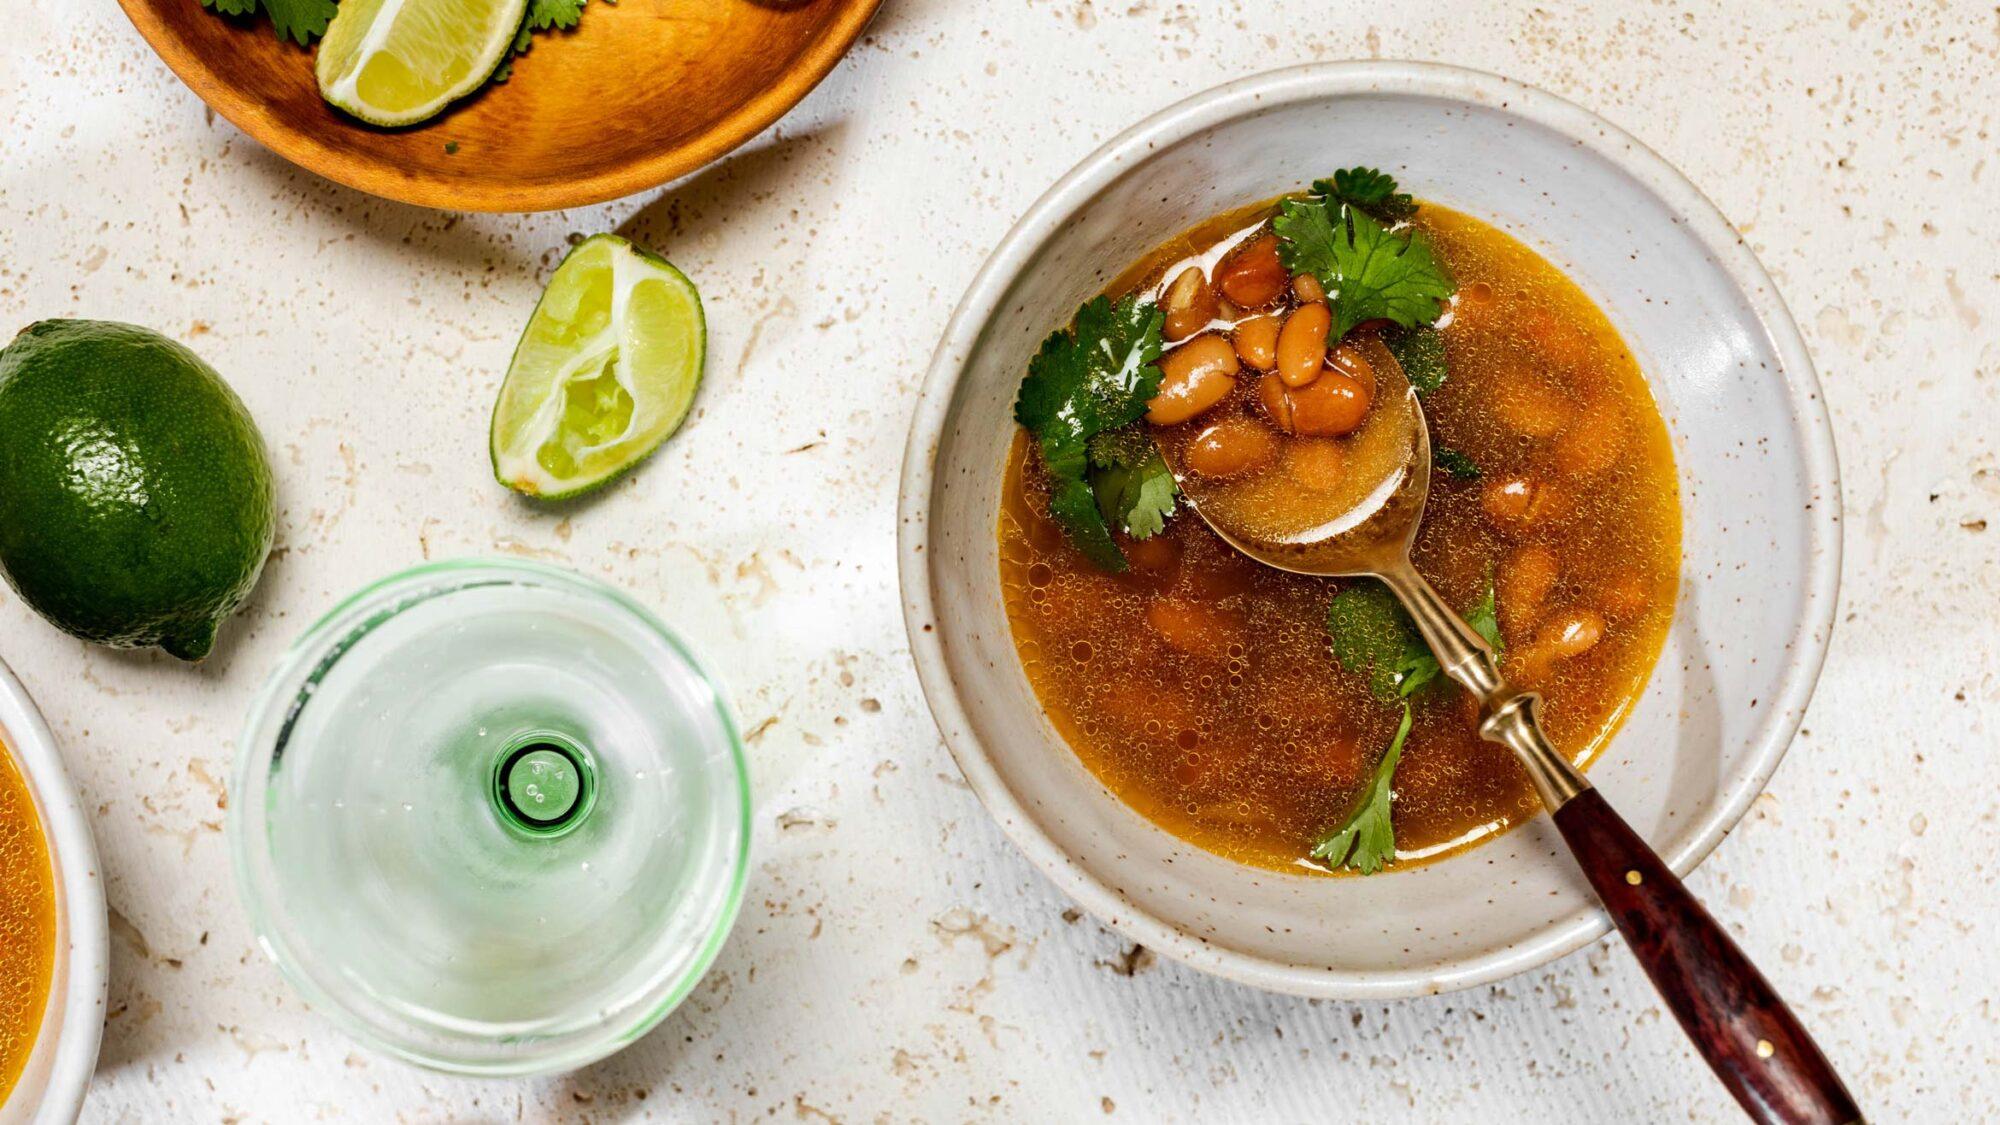 Article-PInto-Bean-Broth-Recipe